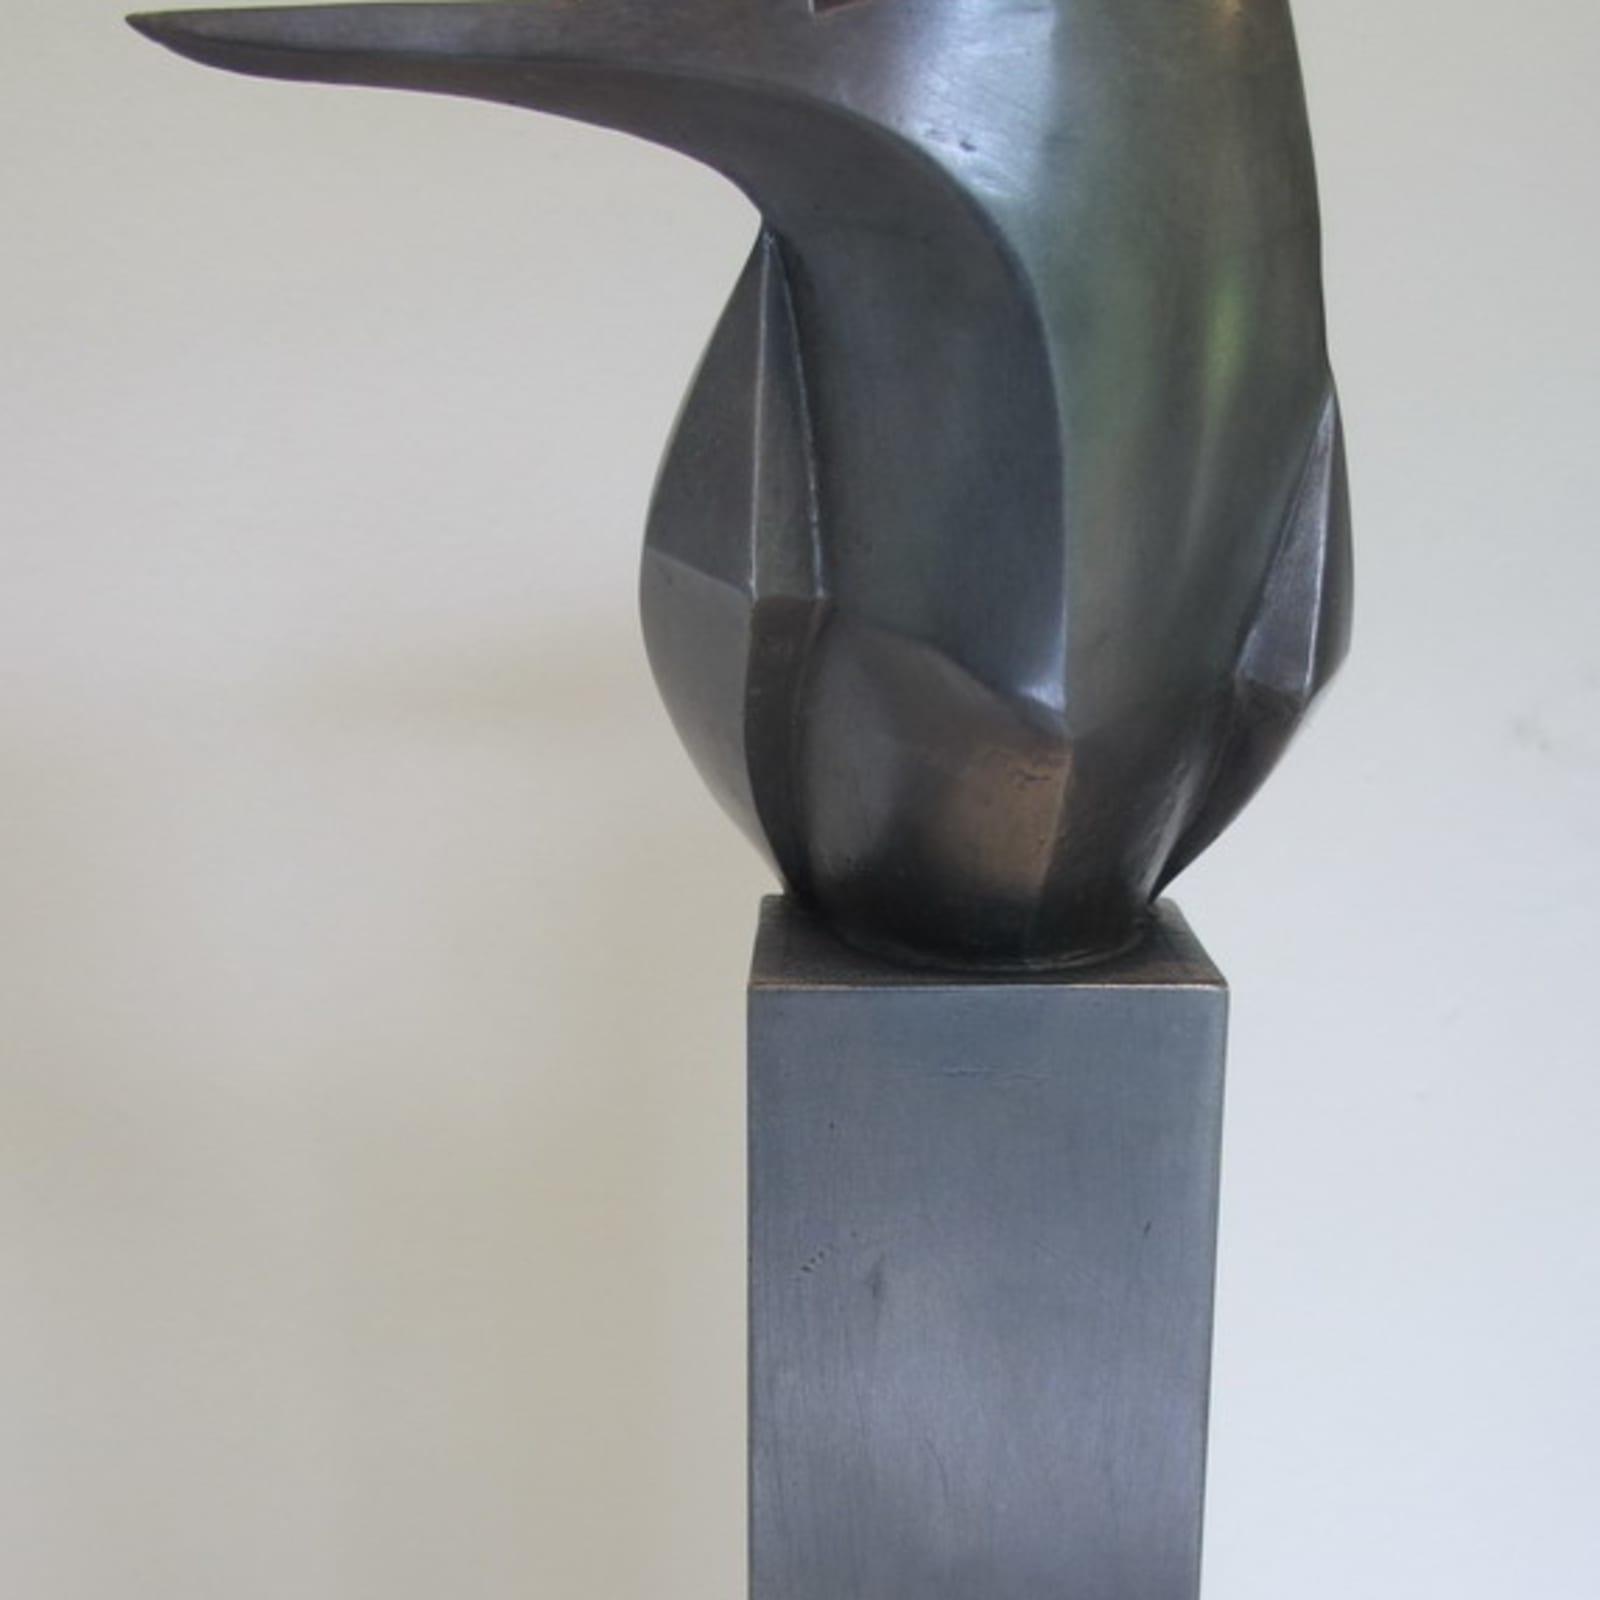 Paul Harvey, Kingfisher, 2019